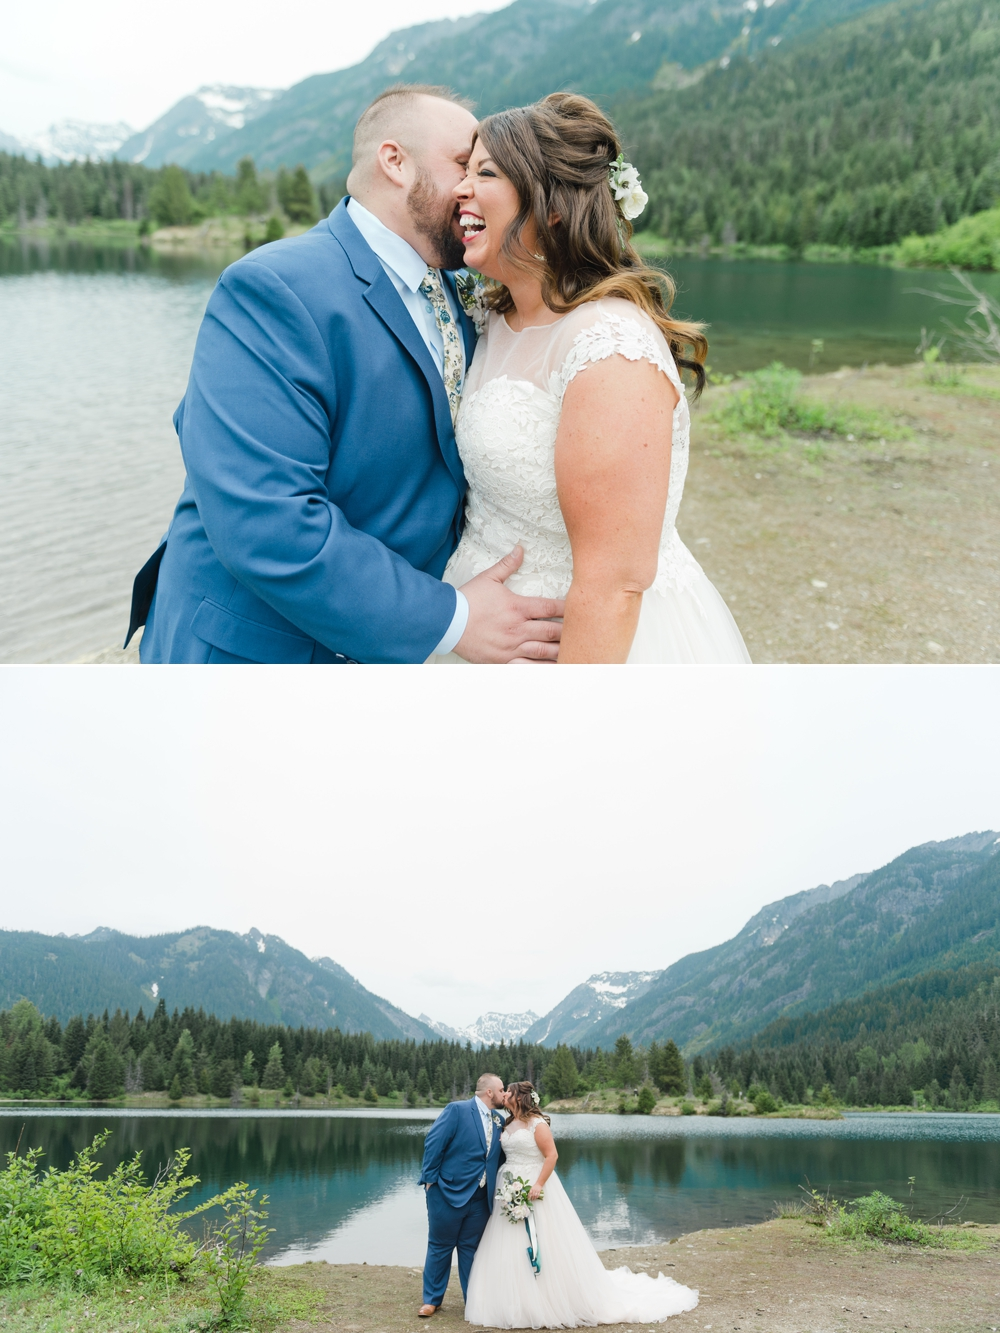 gold-creek-pond-snoqualamie-pass-wedding-photographer-20.jpg